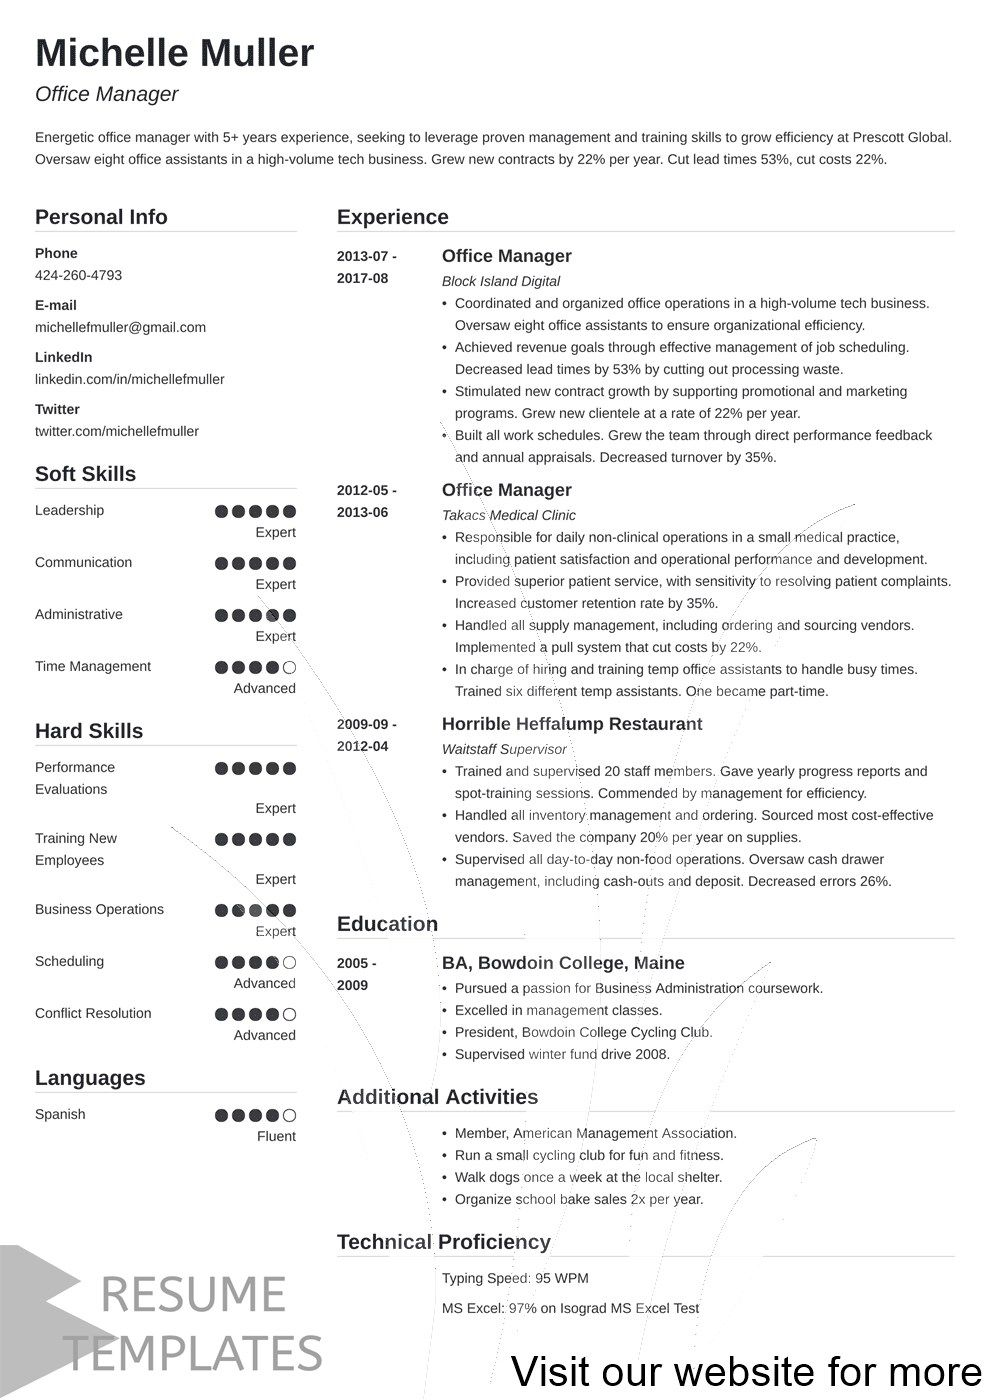 free resume builder online Best in 2020 Resume cover